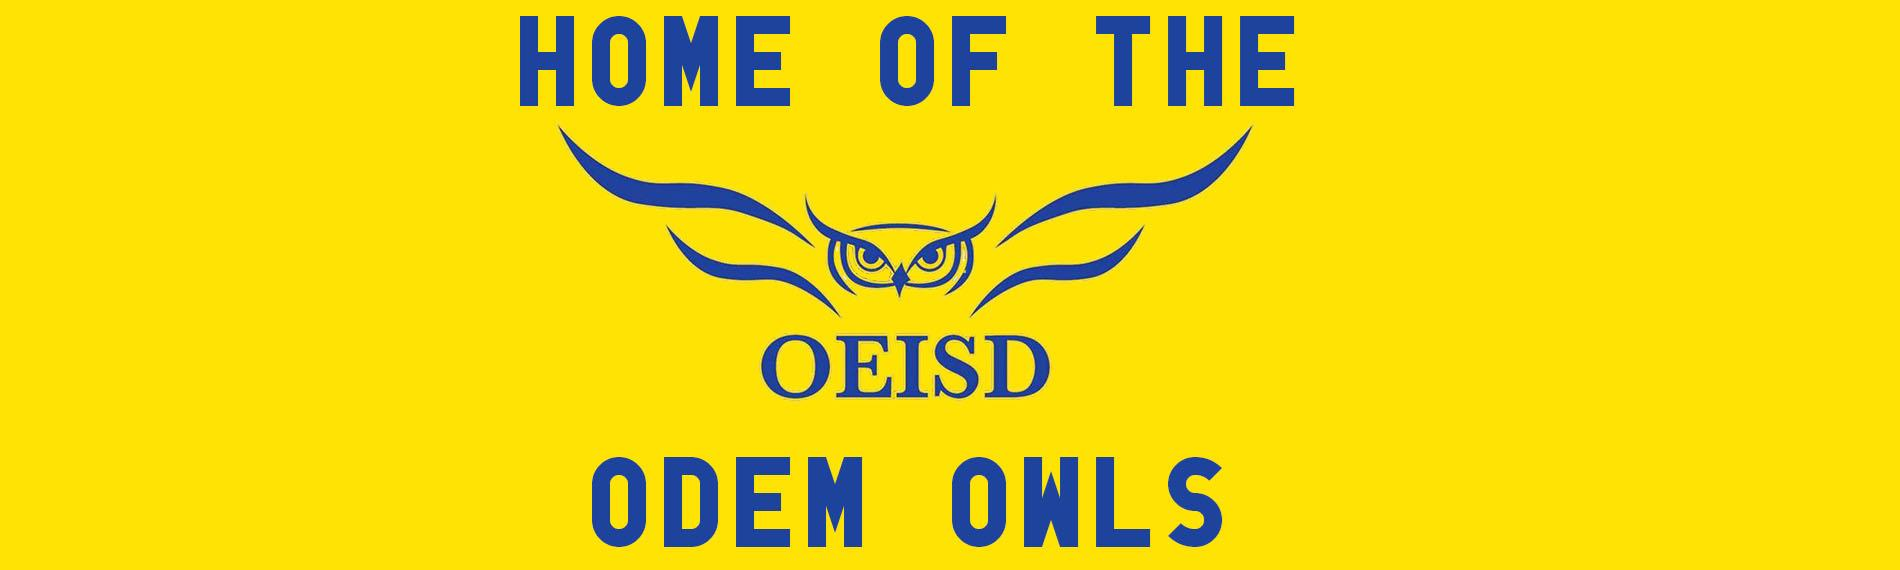 Odem Owls